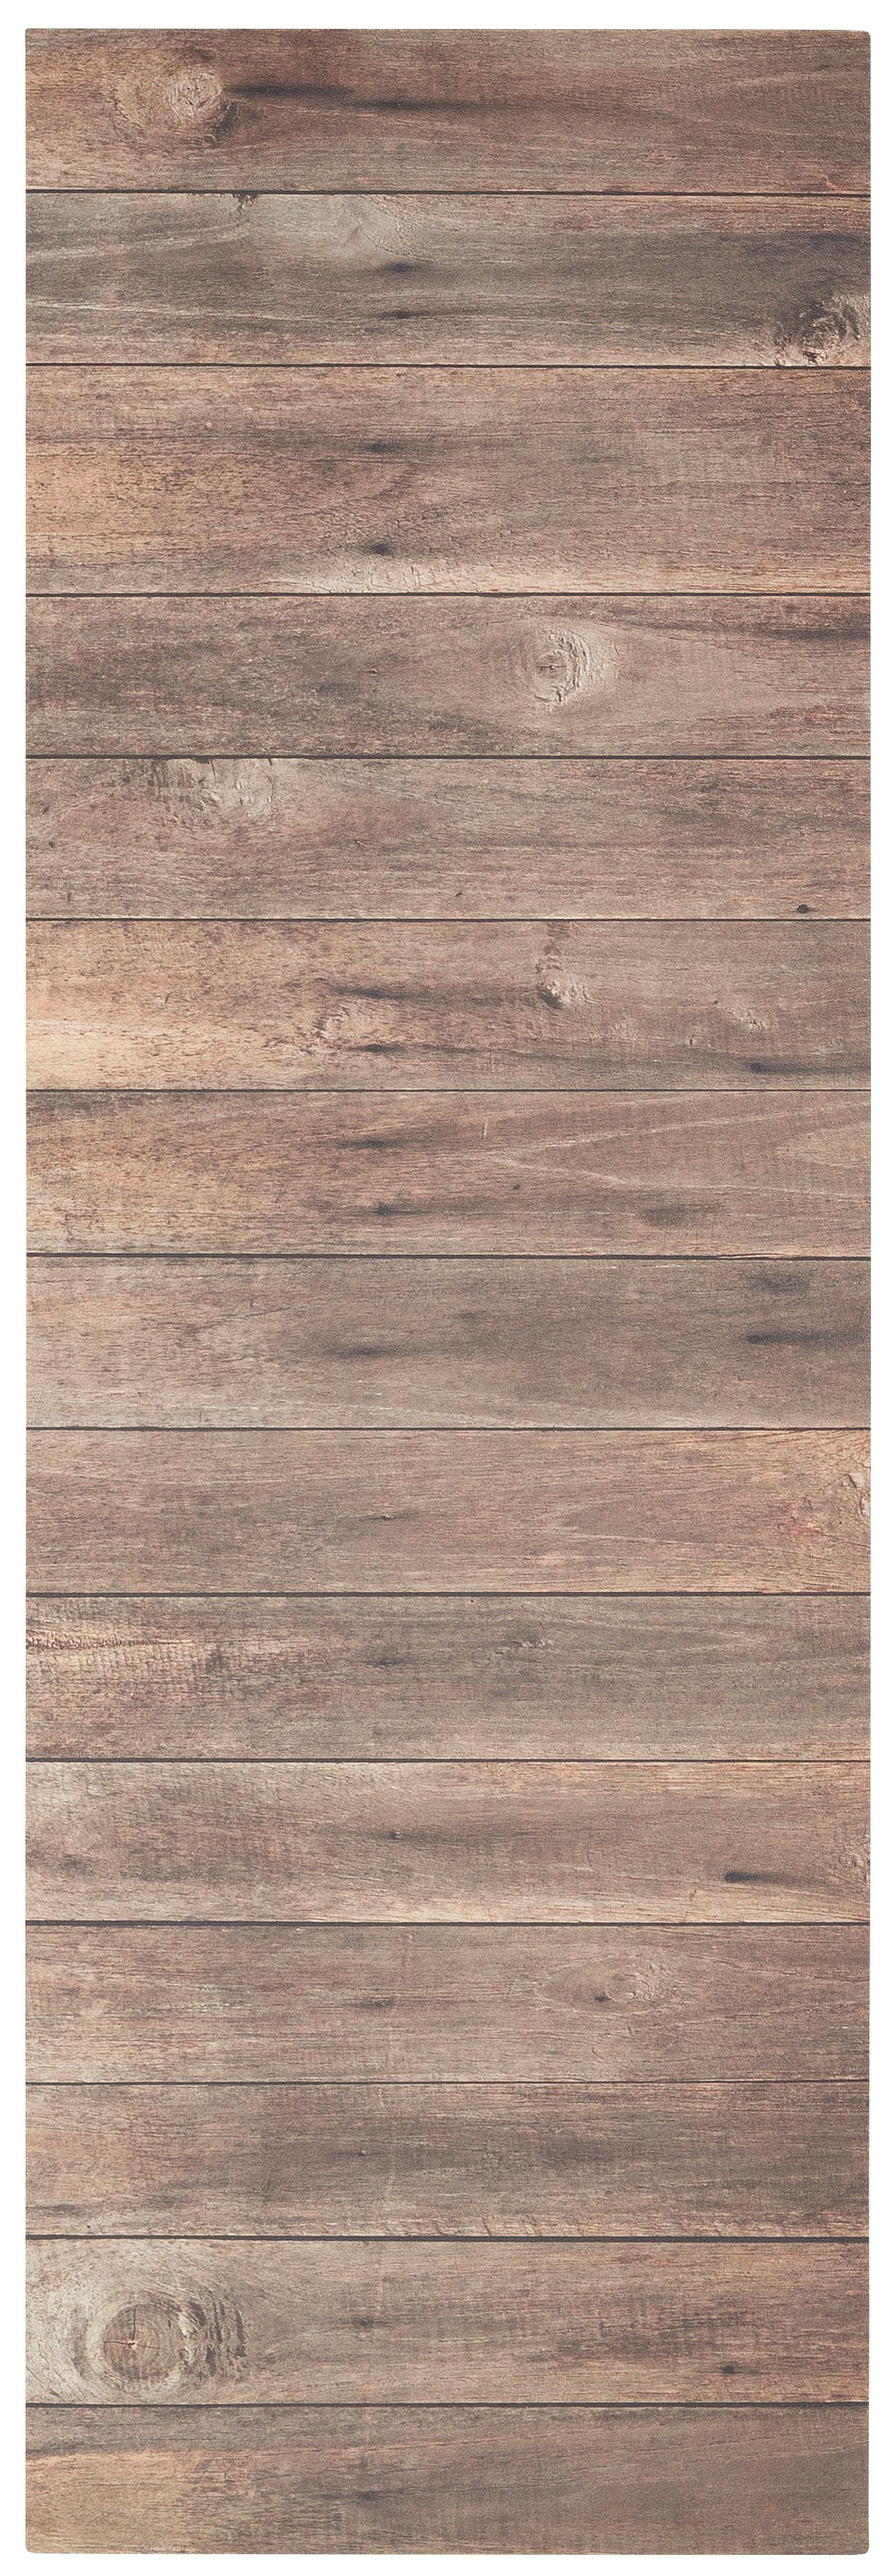 Läufer Holz my home rechteckig Höhe 2 mm gedruckt